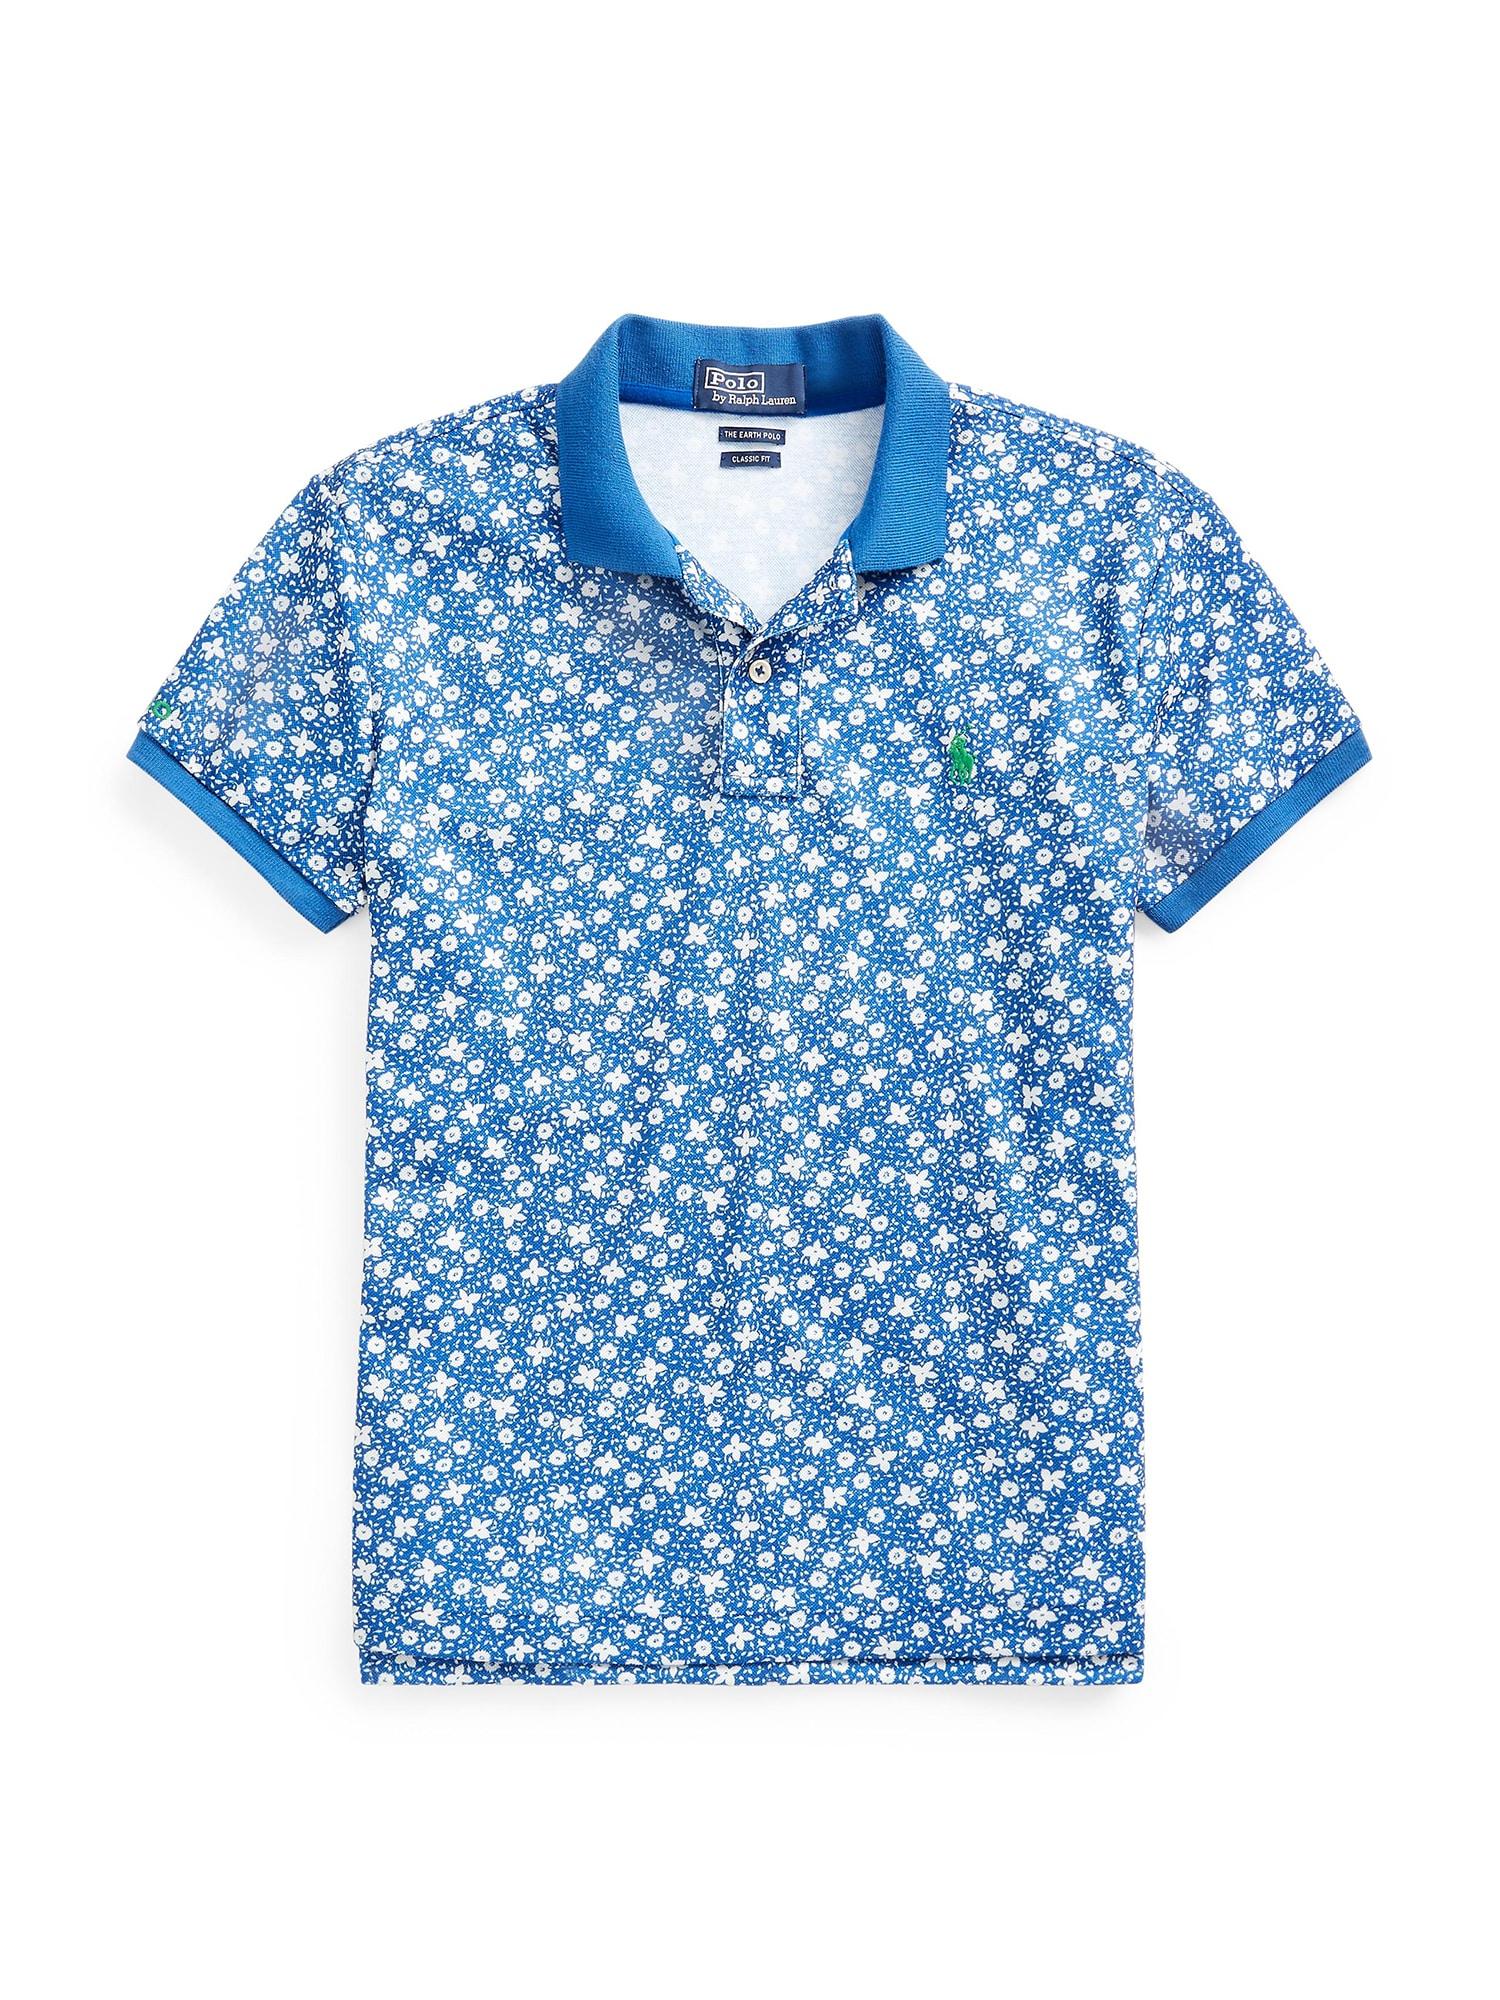 POLO RALPH LAUREN Marškinėliai 'PRNT CLSC FT' mėlyna / balta